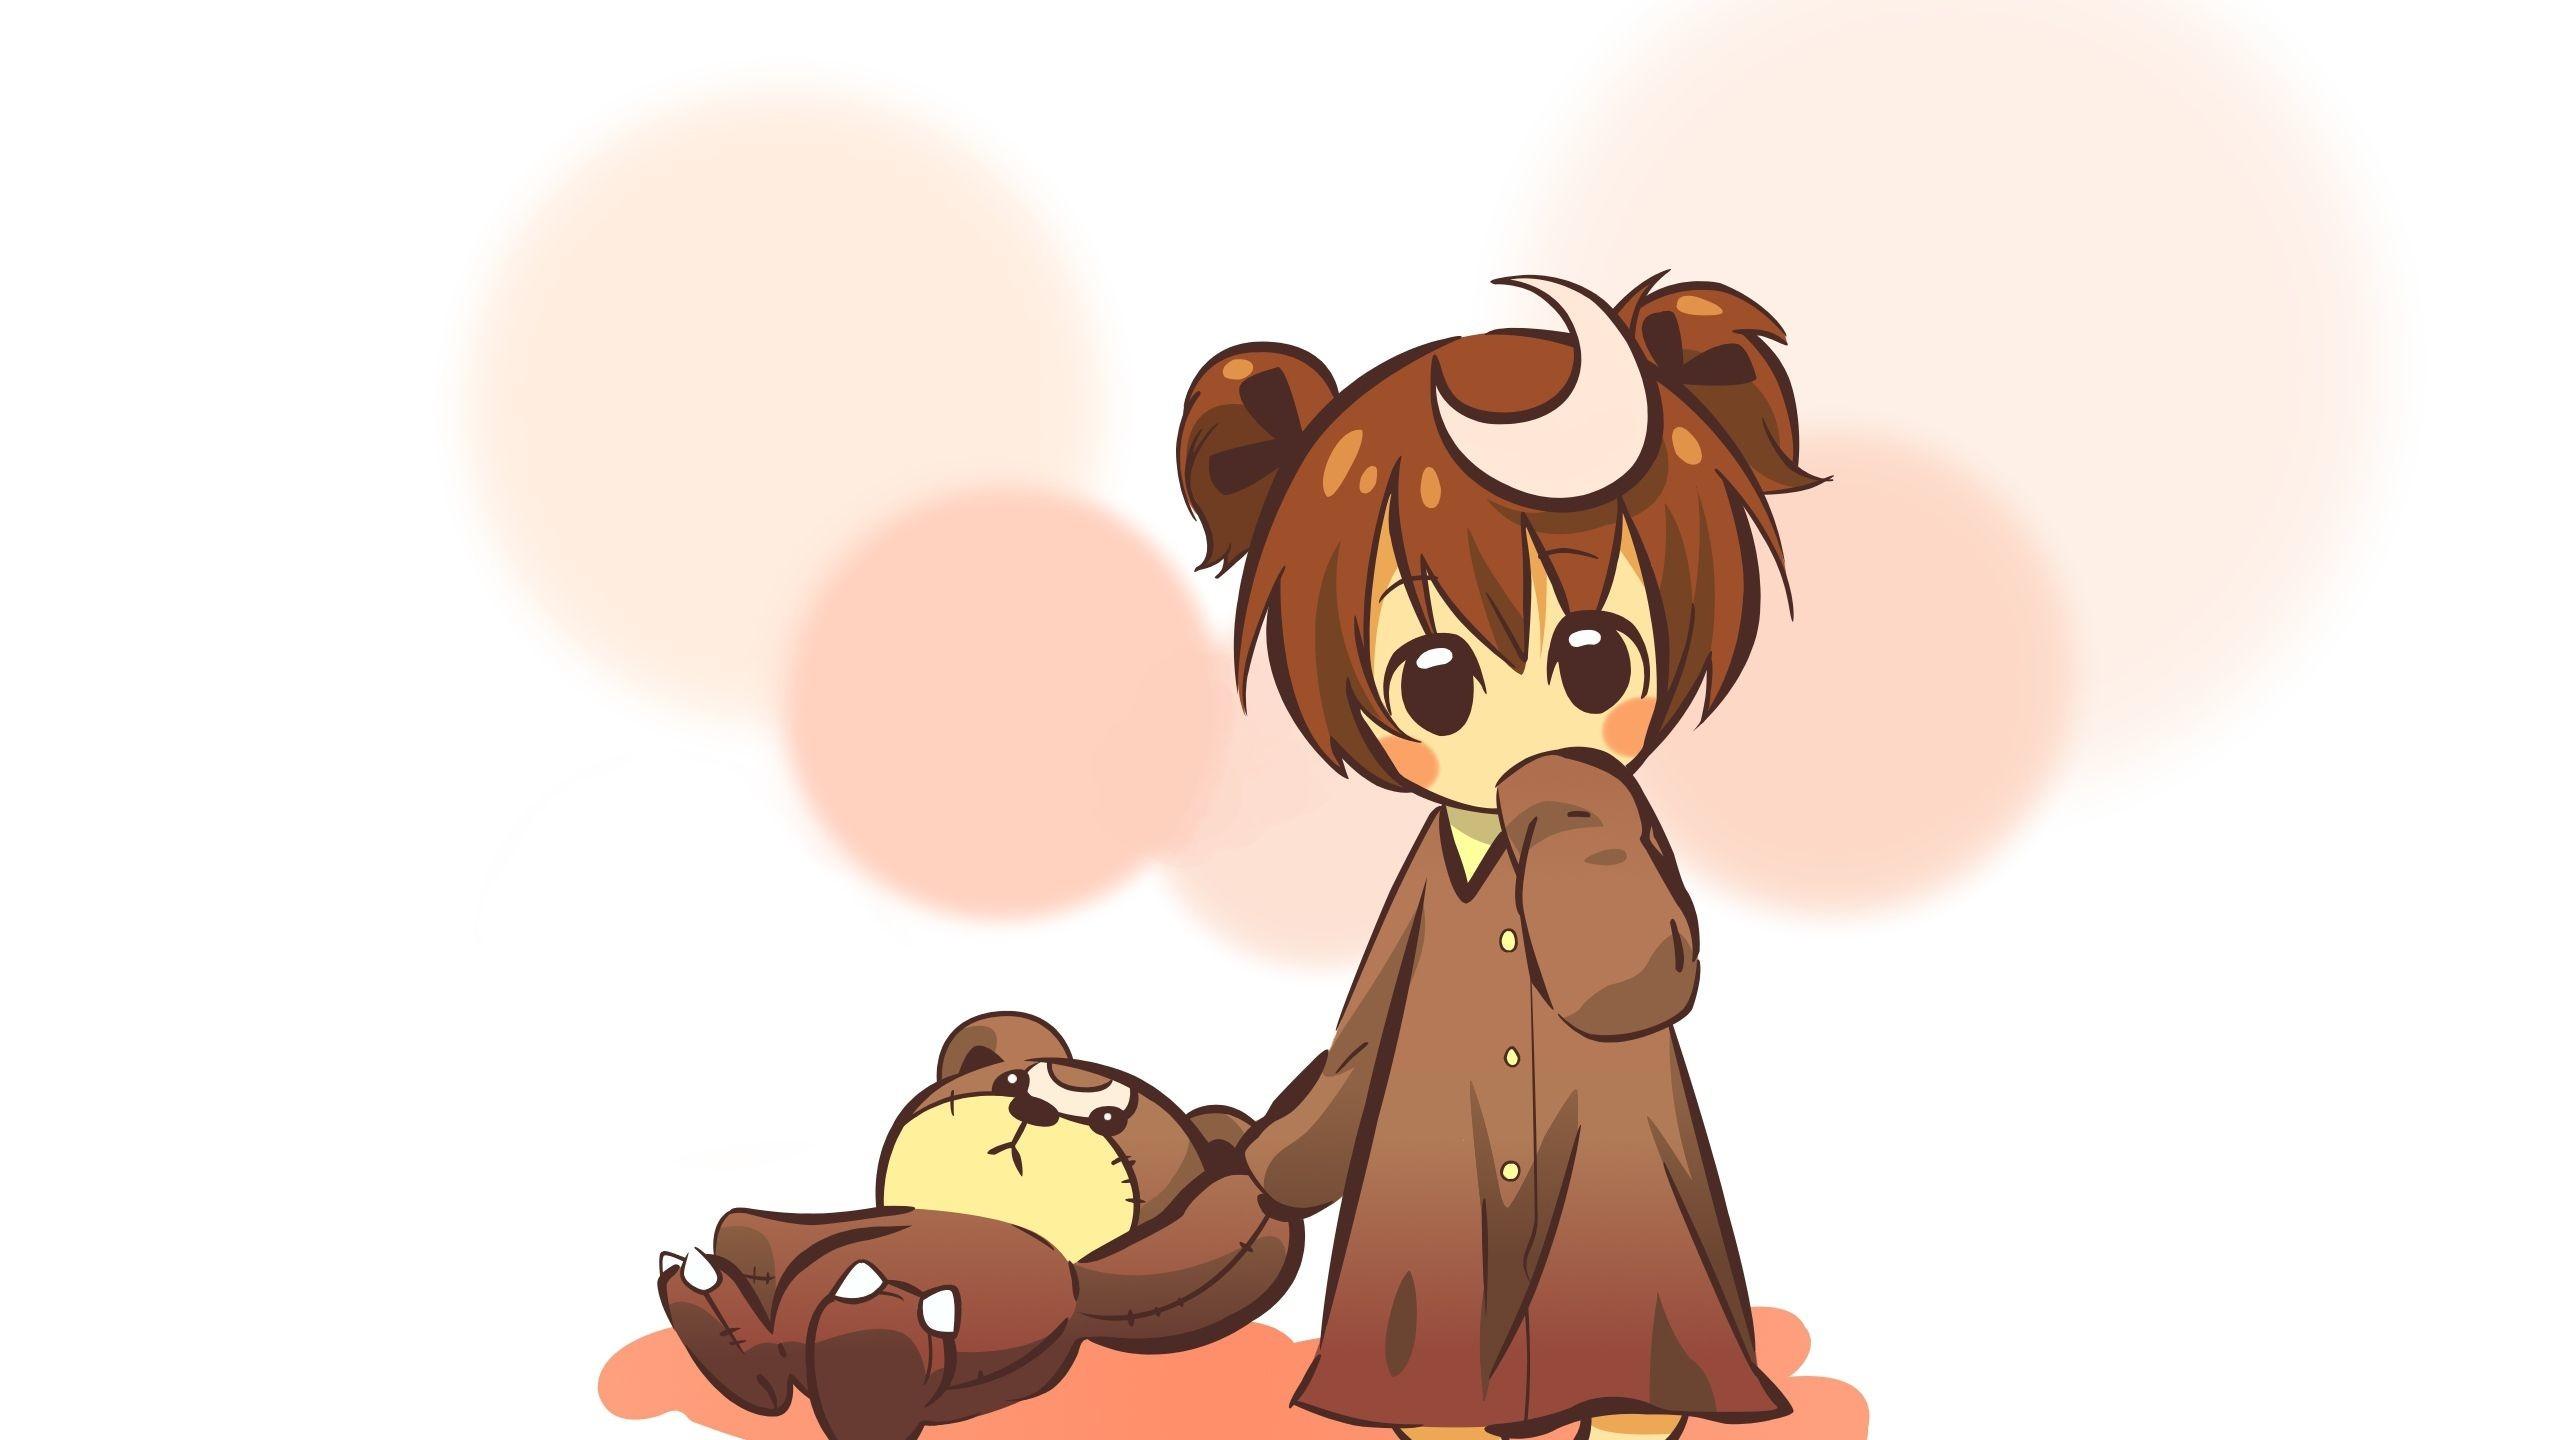 Hd wallpaper kawaii – Kawaii Mac Imac Anime Girl Cute Toy Bear. Download